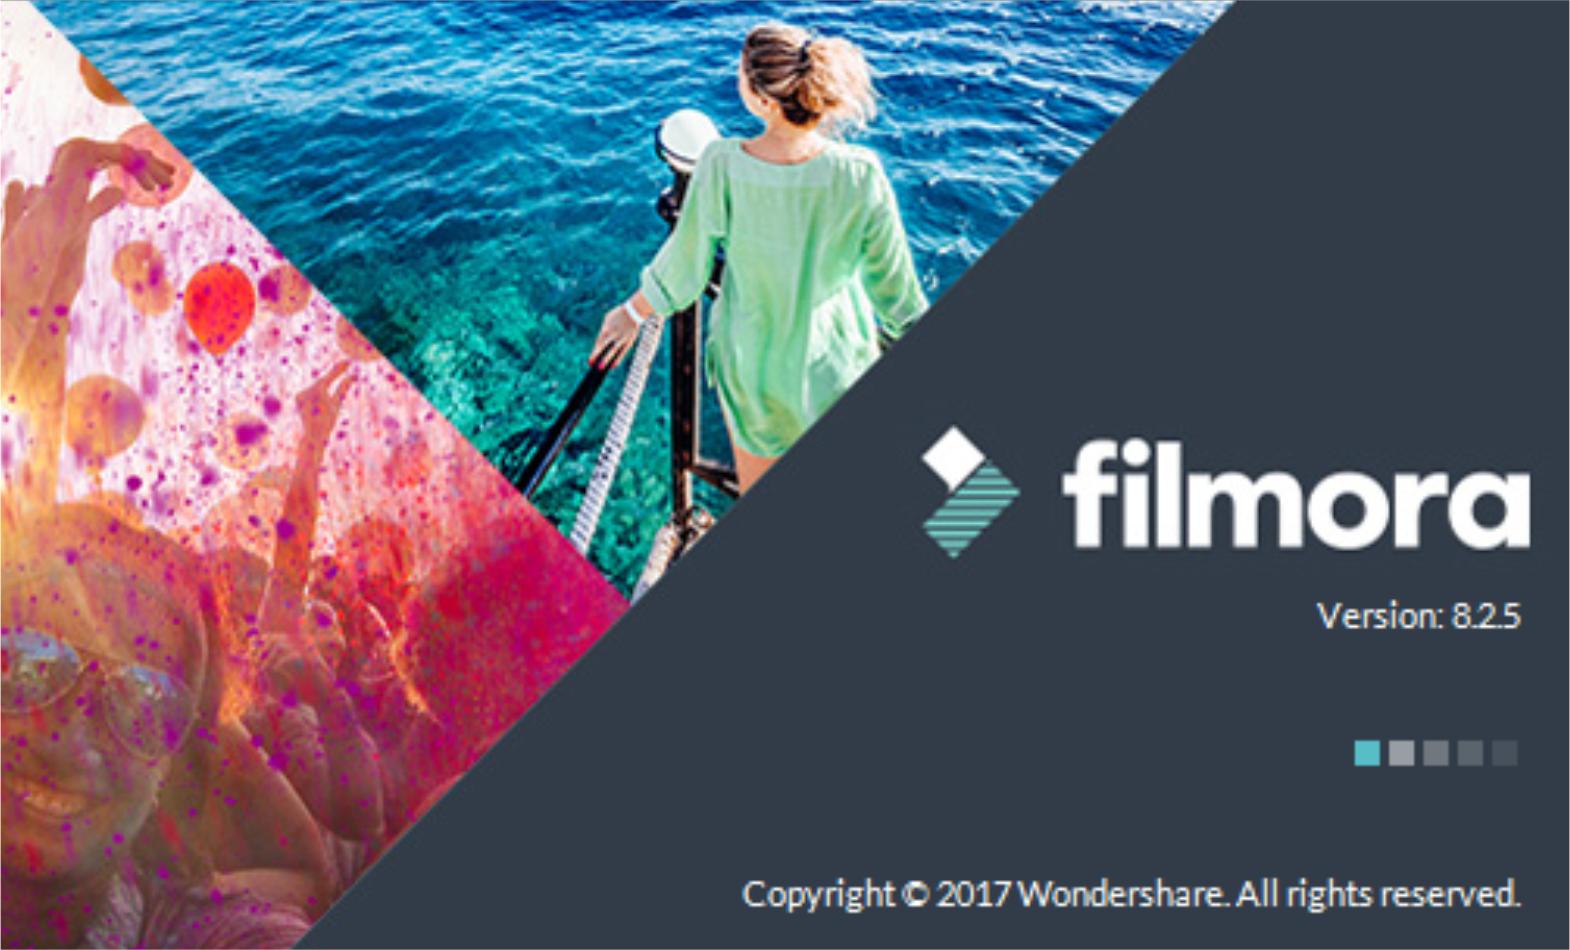 Wondershare Filmora 8.2.5.1 x64